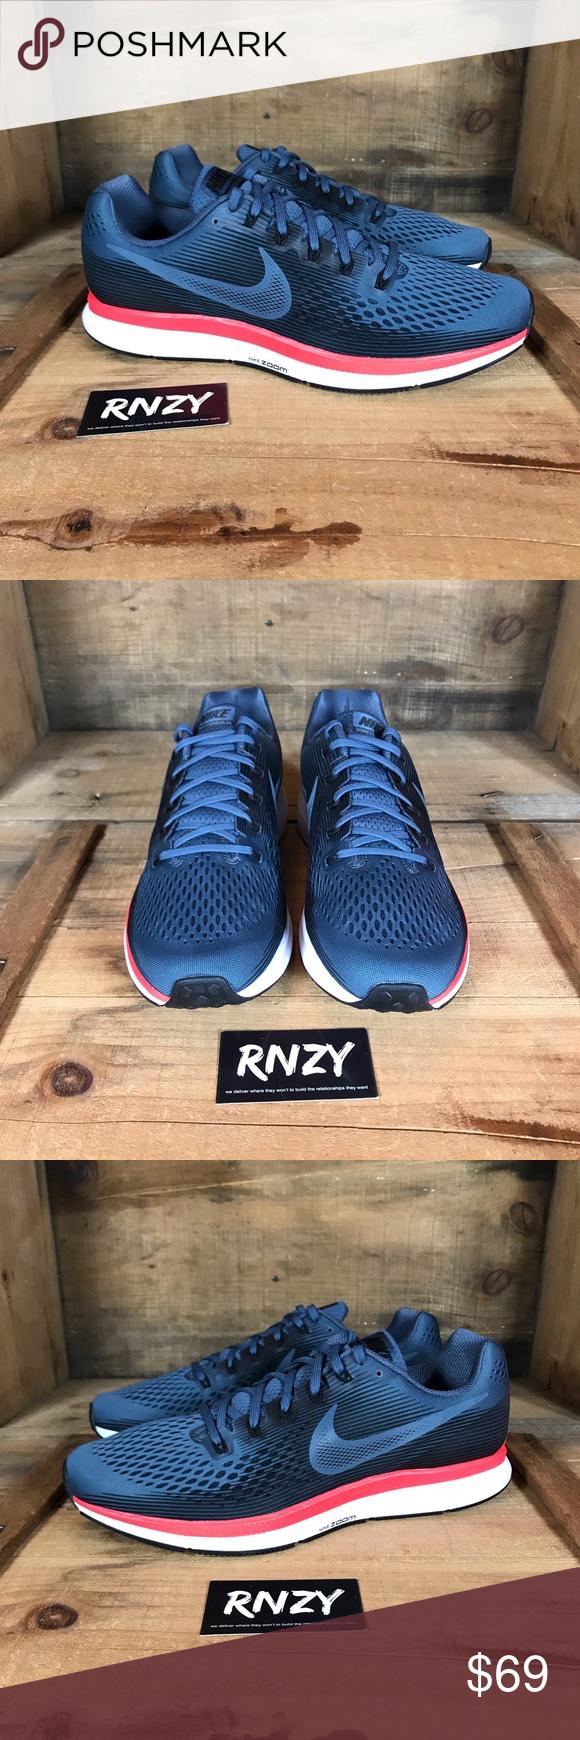 c90847bddfd4 NEW Nike Air Zoom Pegasus 34 Brand new. Never worn. No box. No rips ...